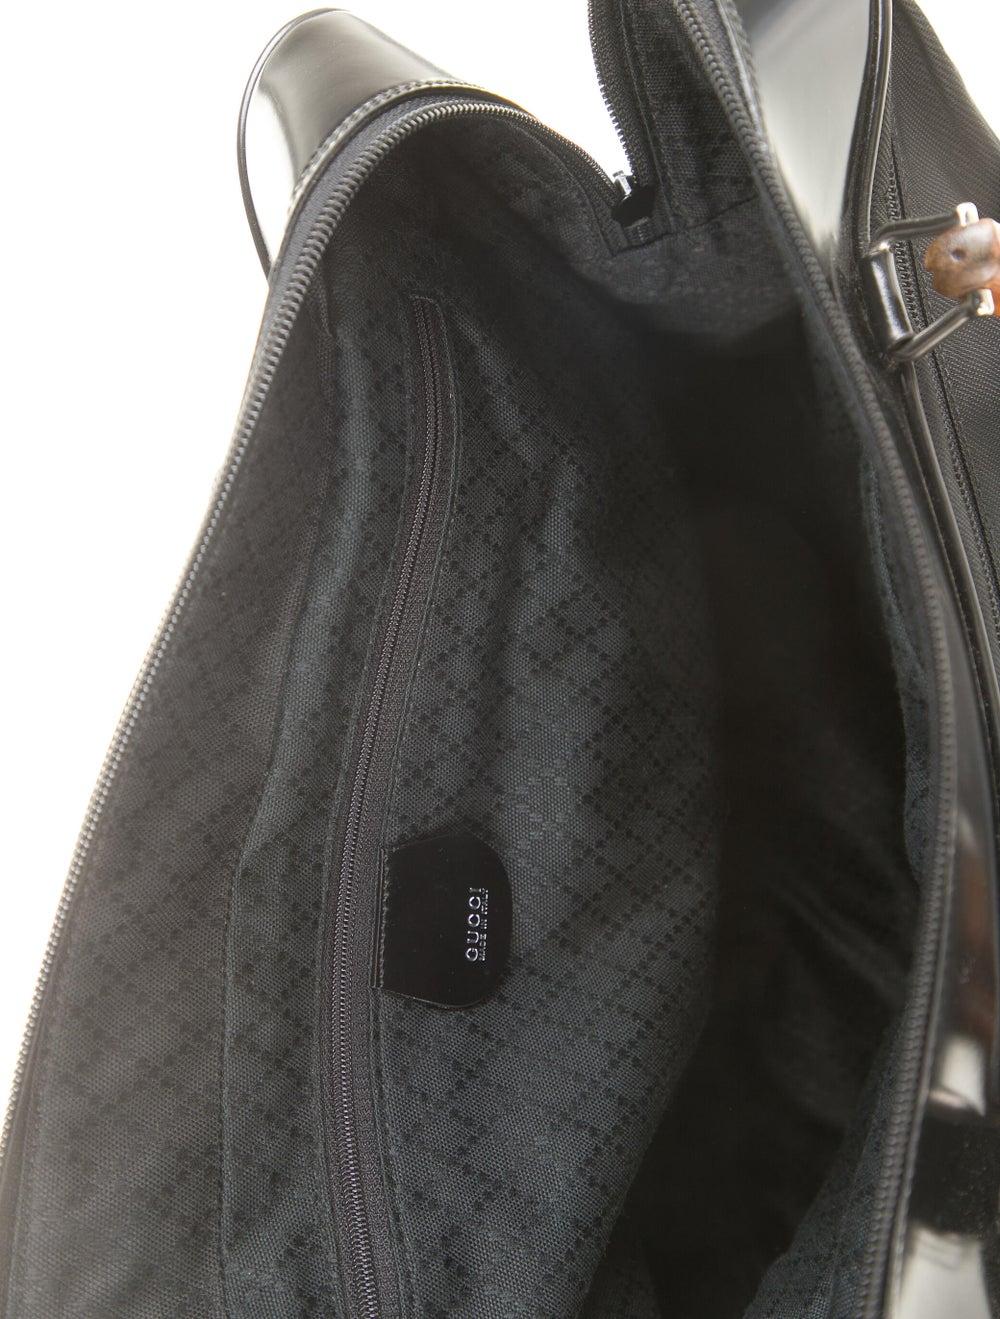 Gucci Vintage Nylon Bamboo Handle Bag Black - image 5